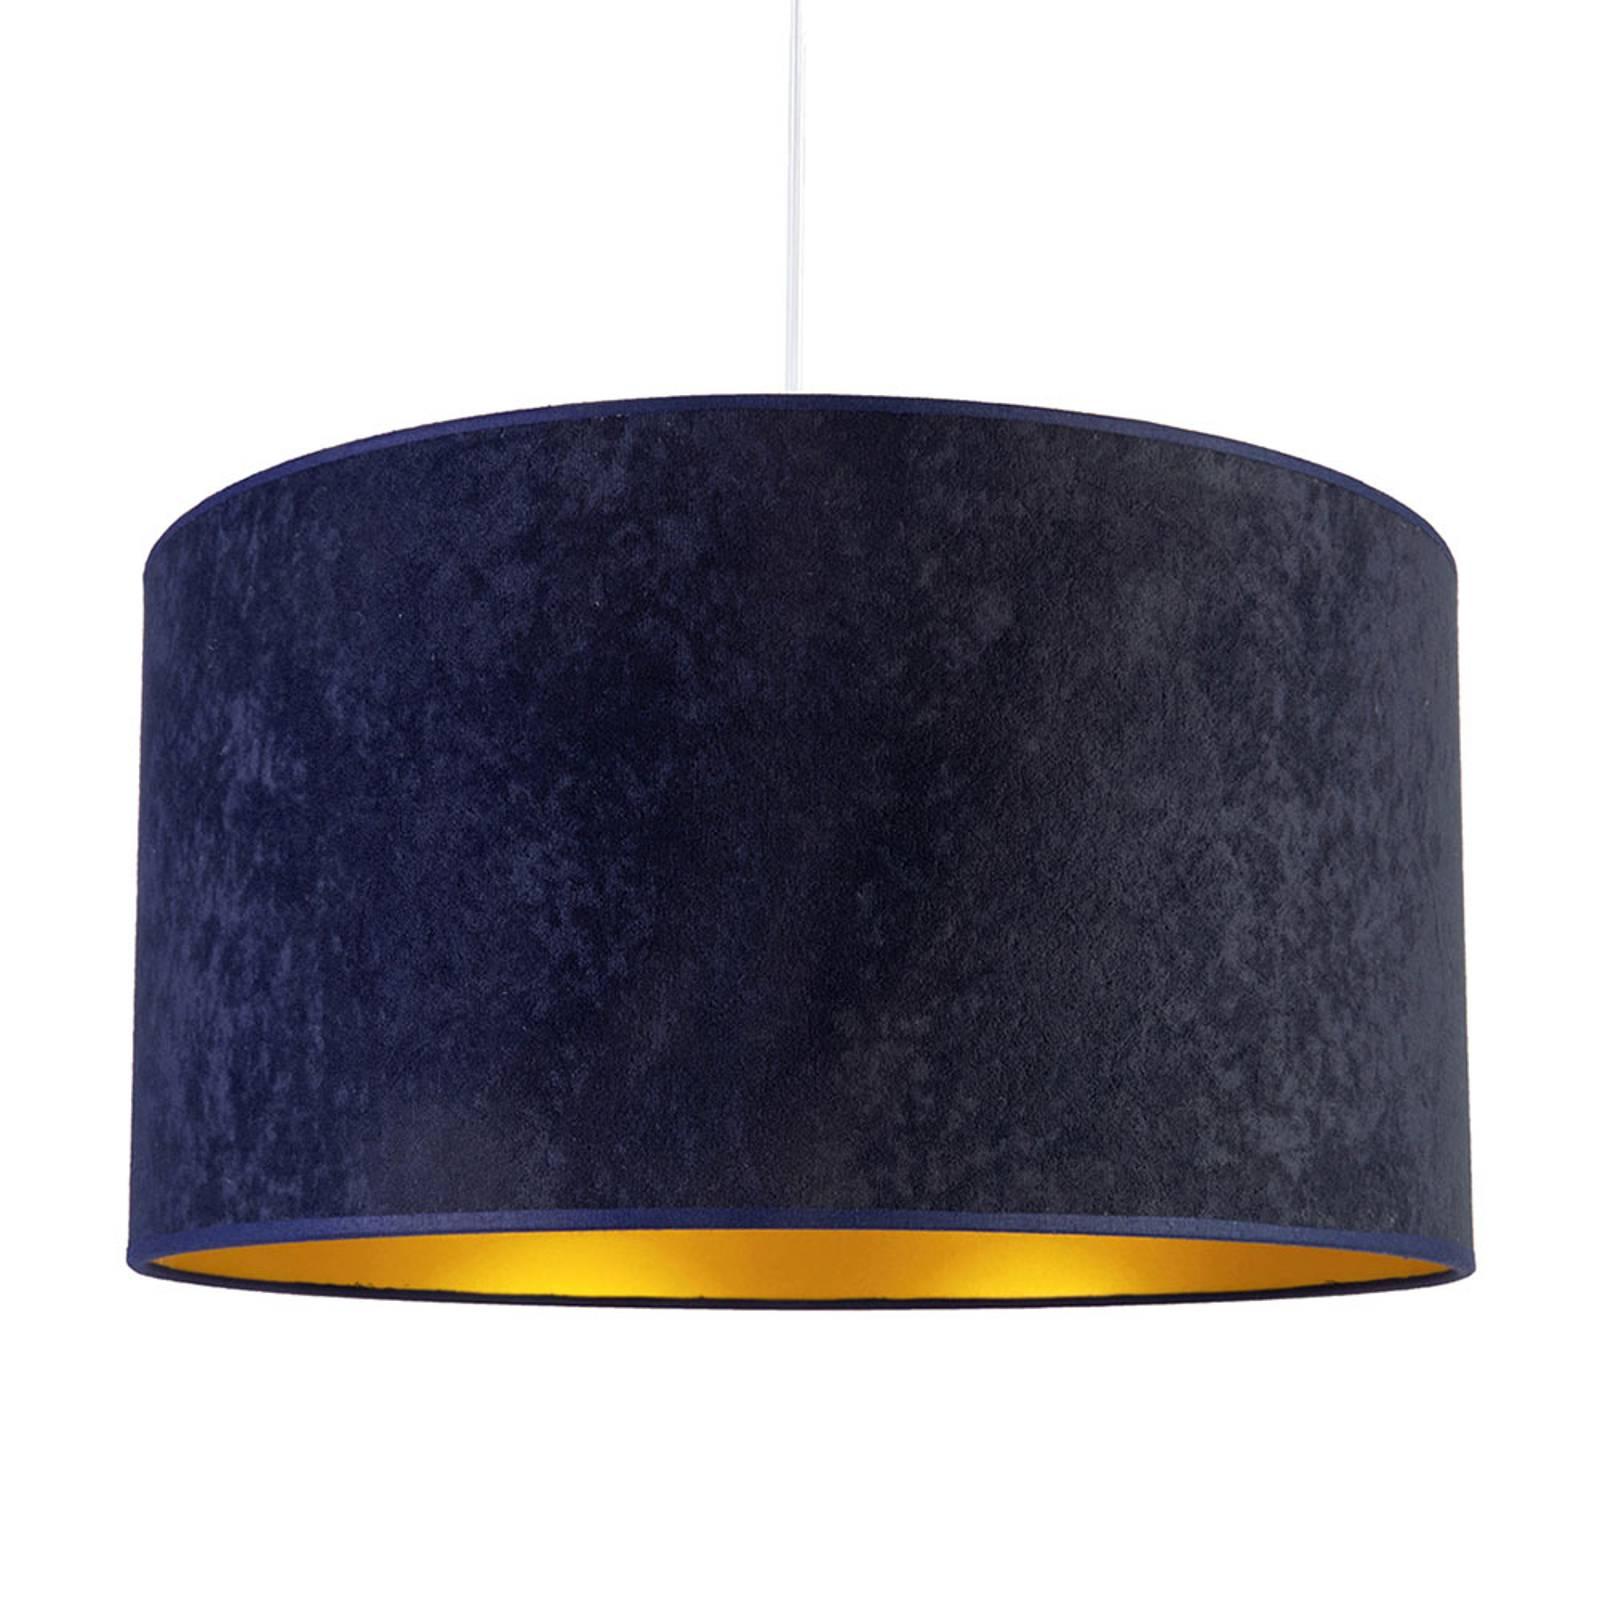 Hanglamp Roller, marineblauw/goud